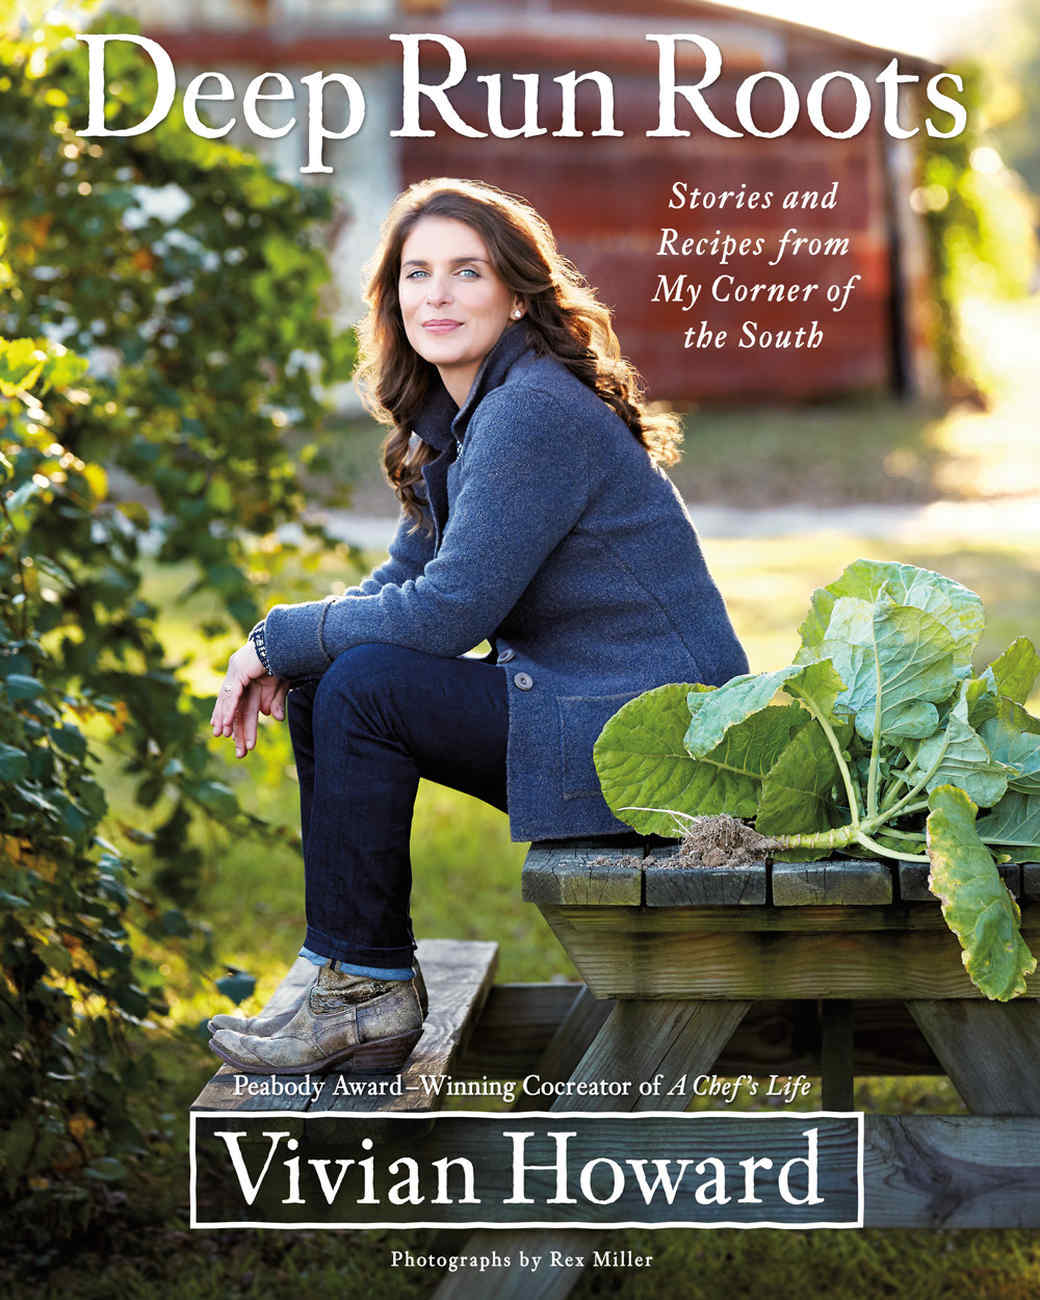 Cover of Vivian Howard's Deep Run Roots